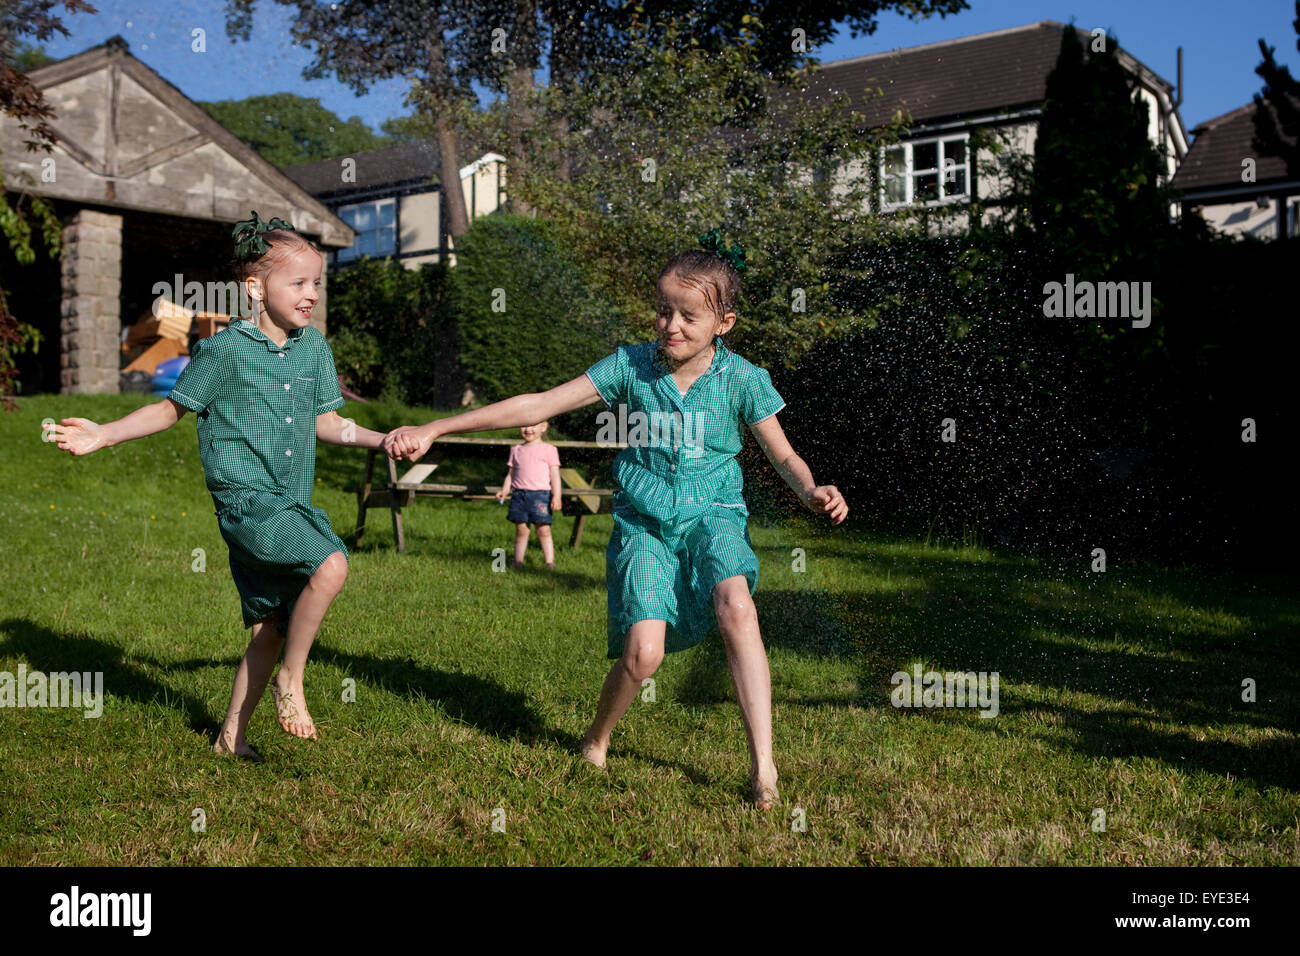 Two children in school dresses running through a water sprinkler. - Stock Image